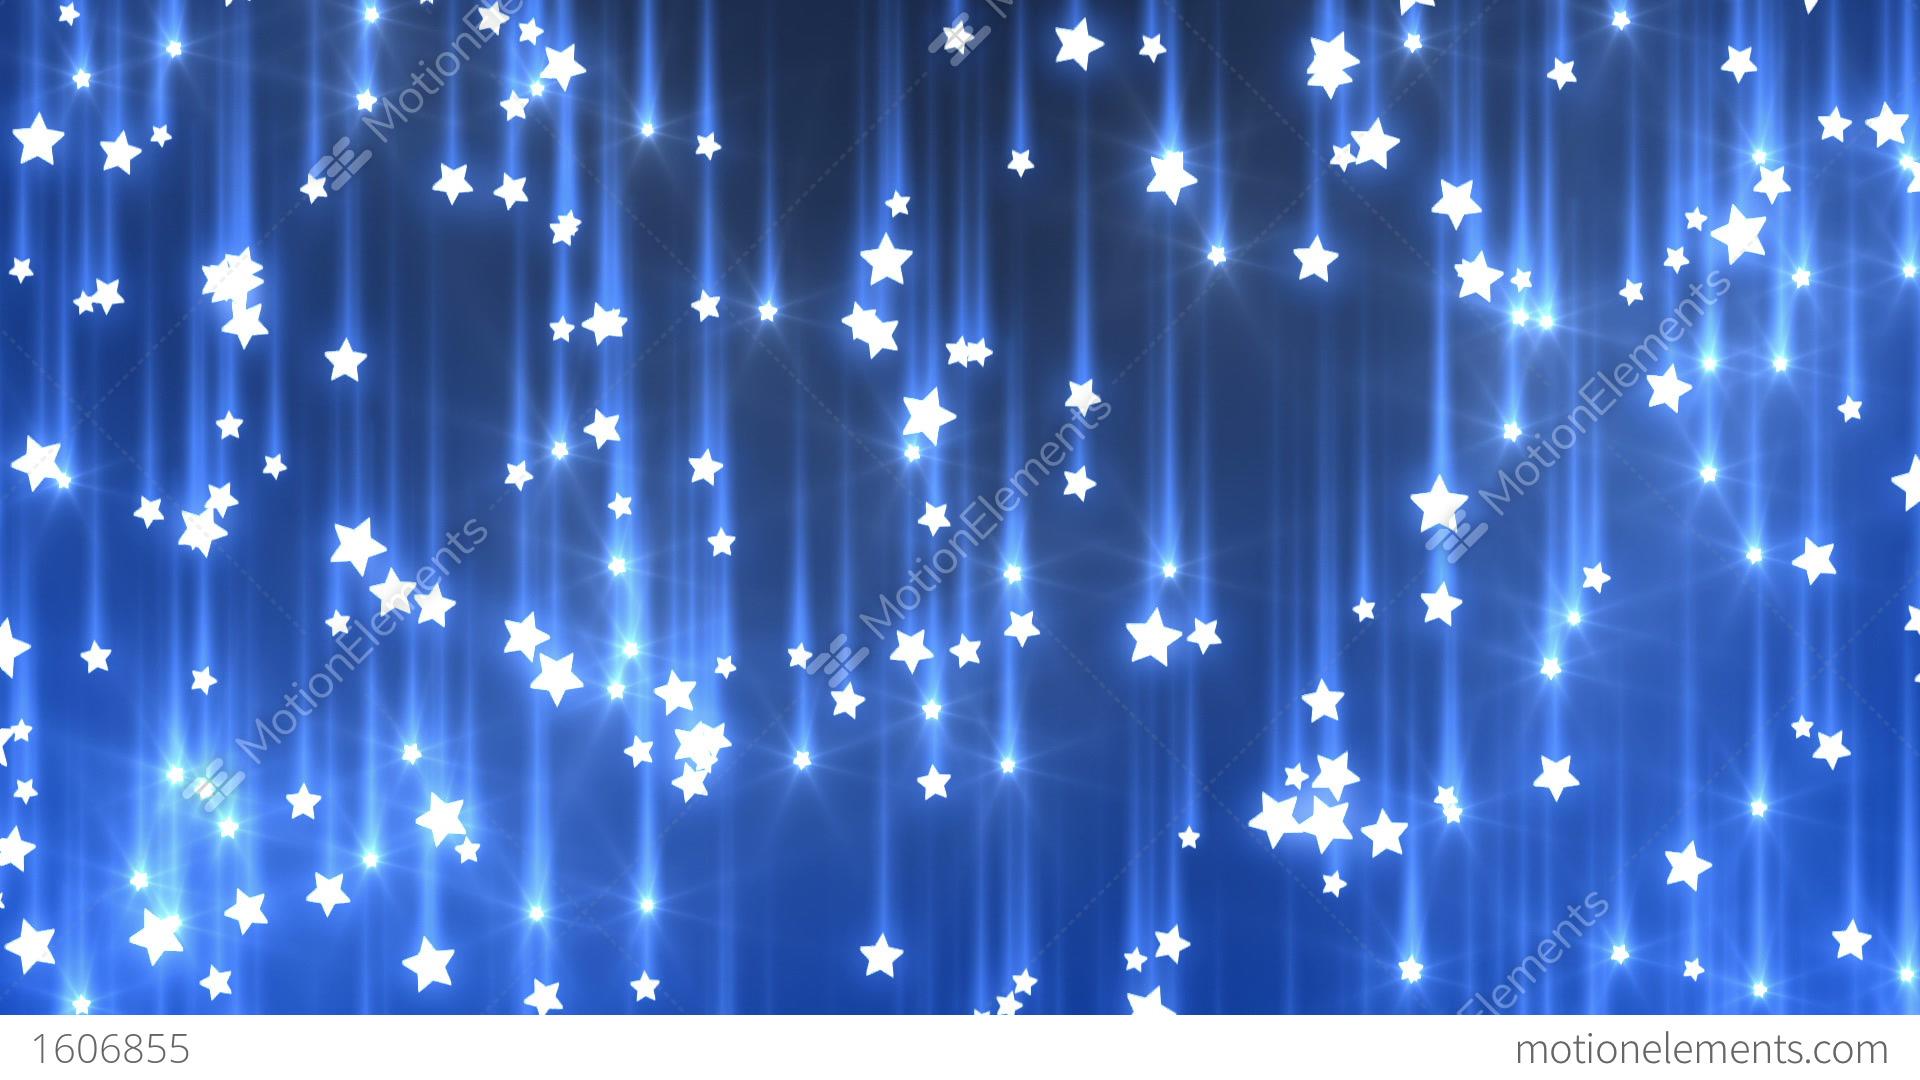 Falling Stars Wallpaper Falling Stars Stock Animation 1606855